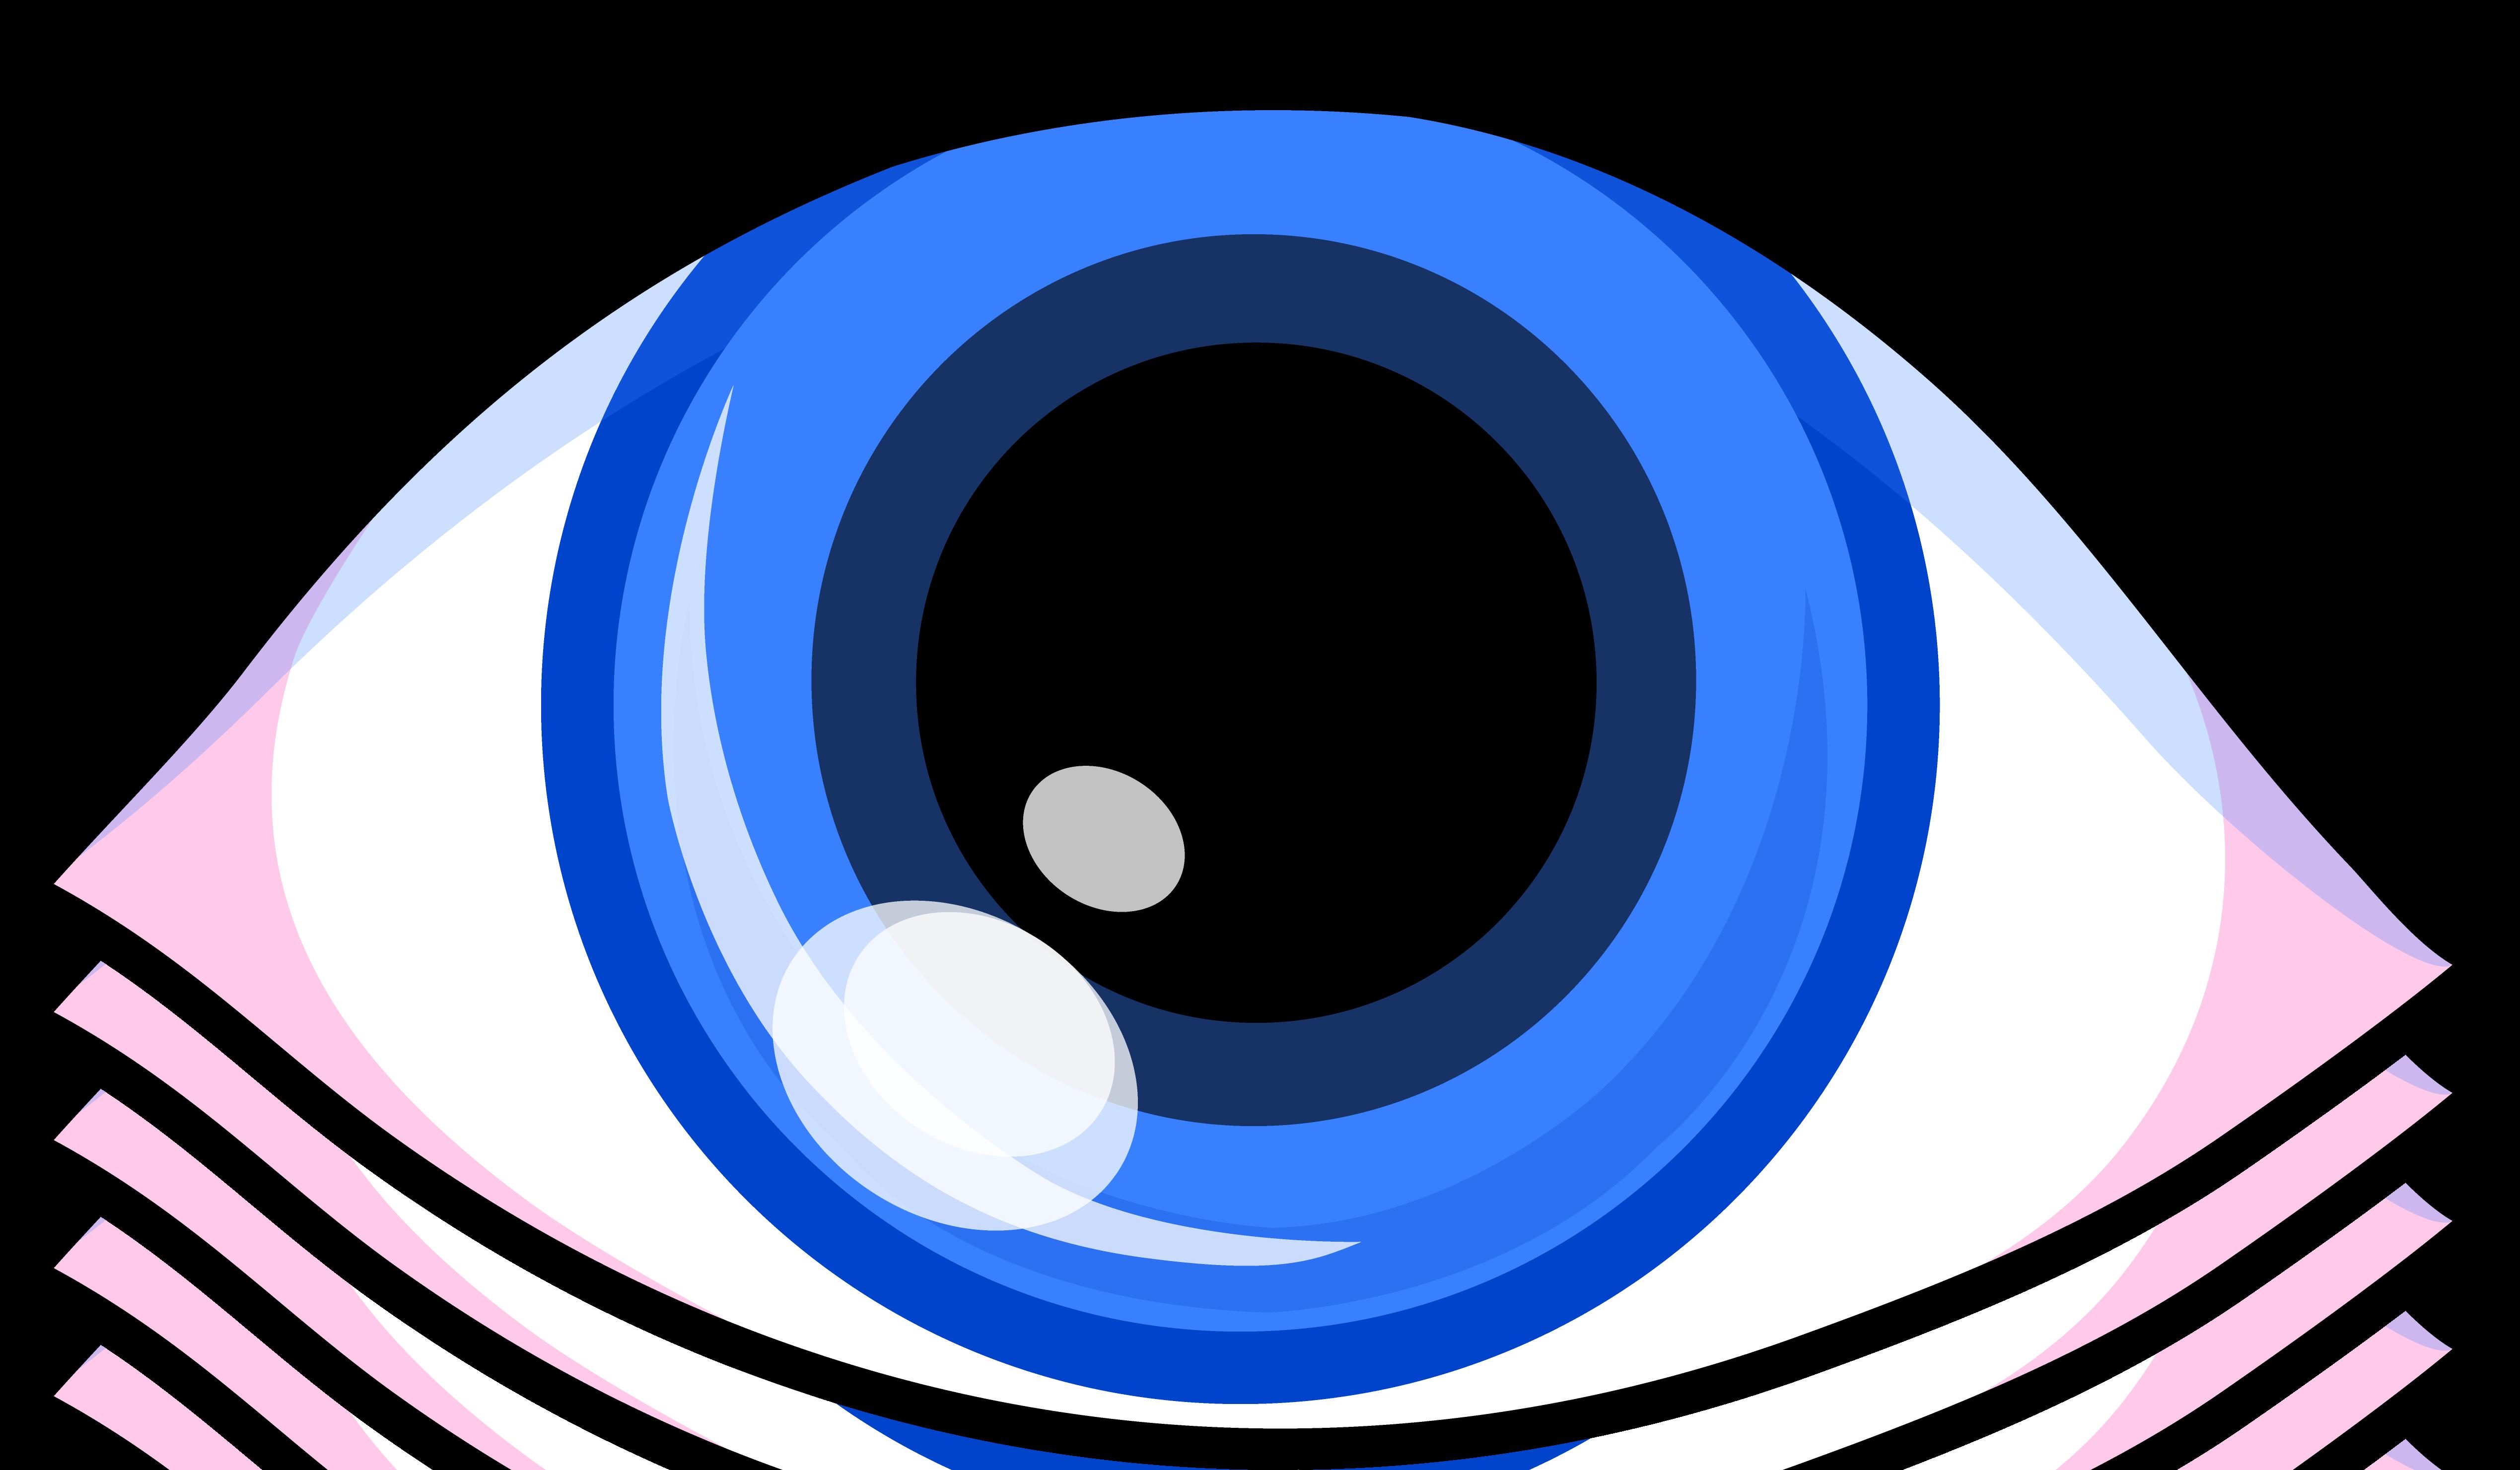 5076x2962 Cartoon Eyeball Images